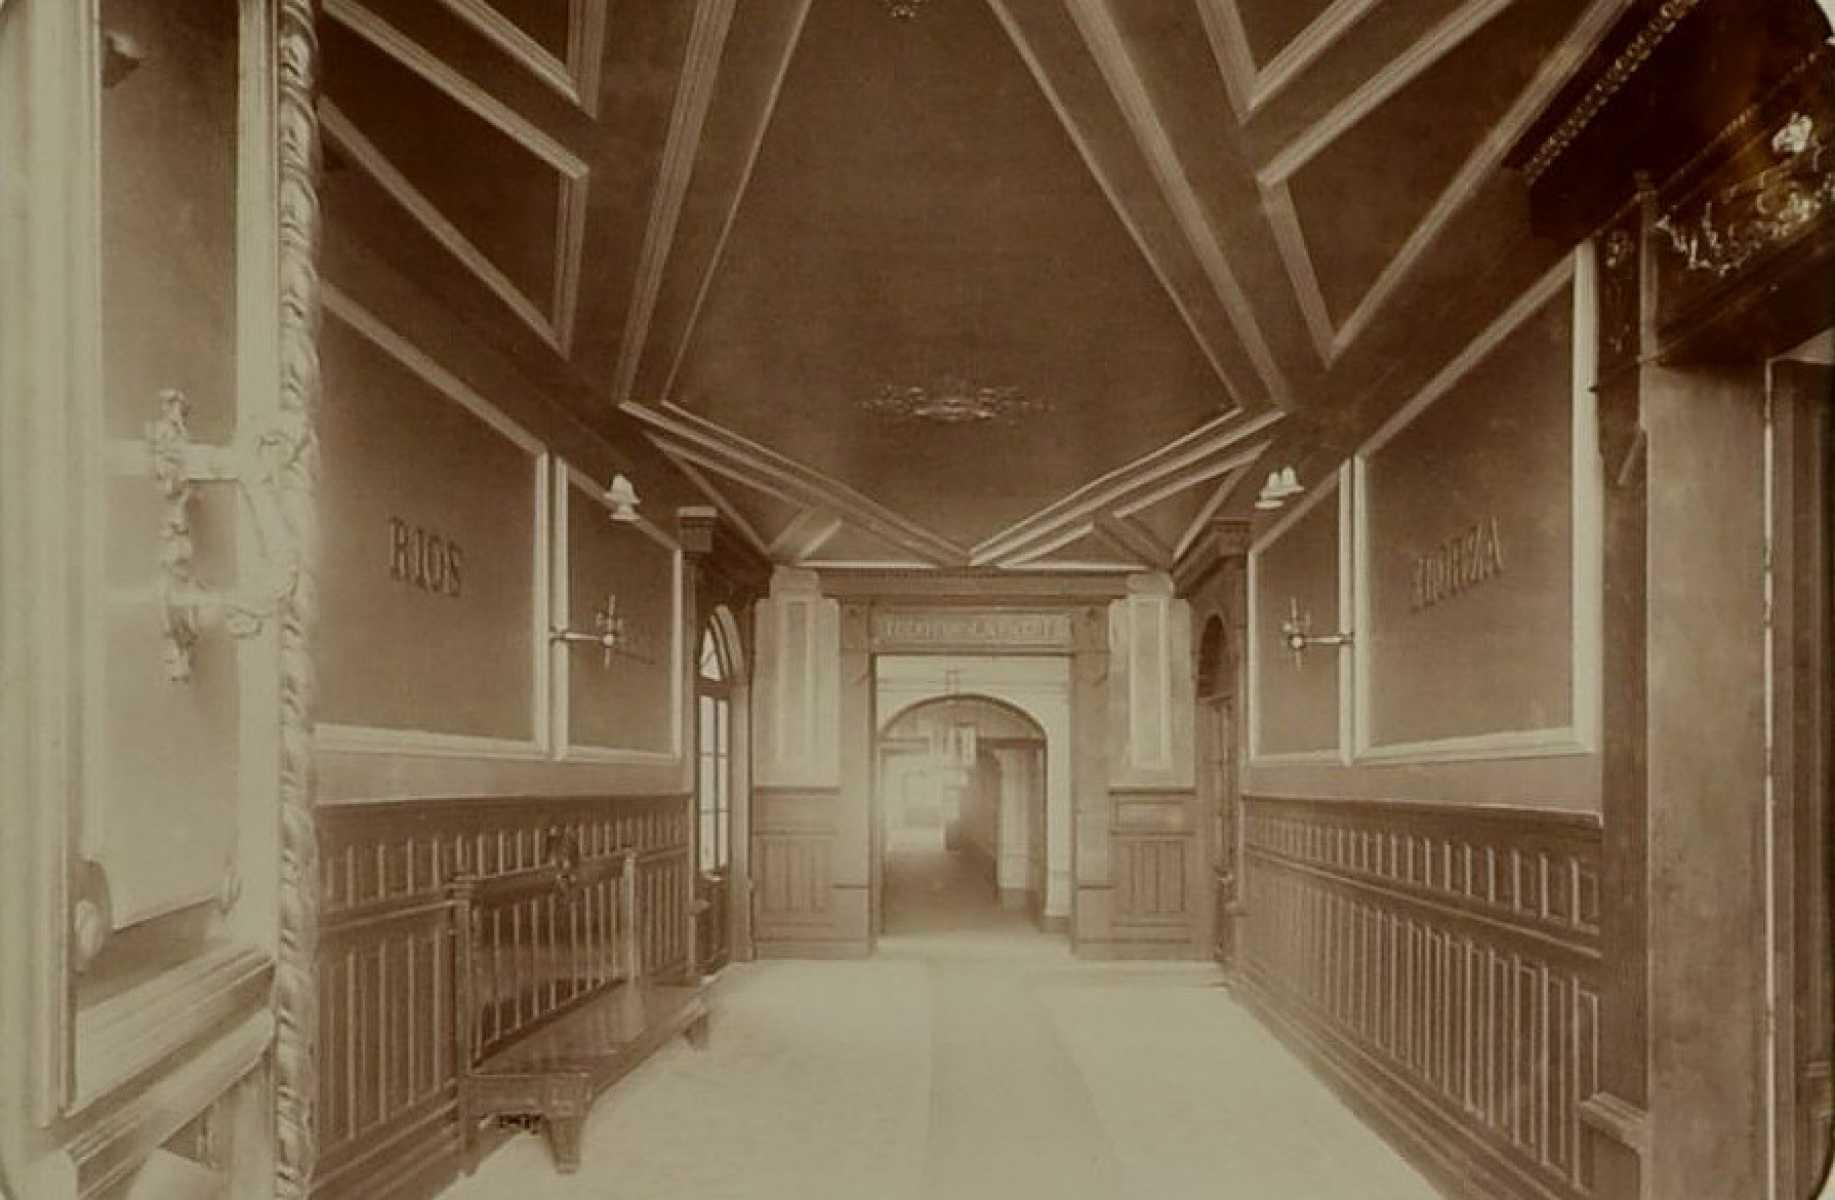 Entrada de Día Sanz, 1897.